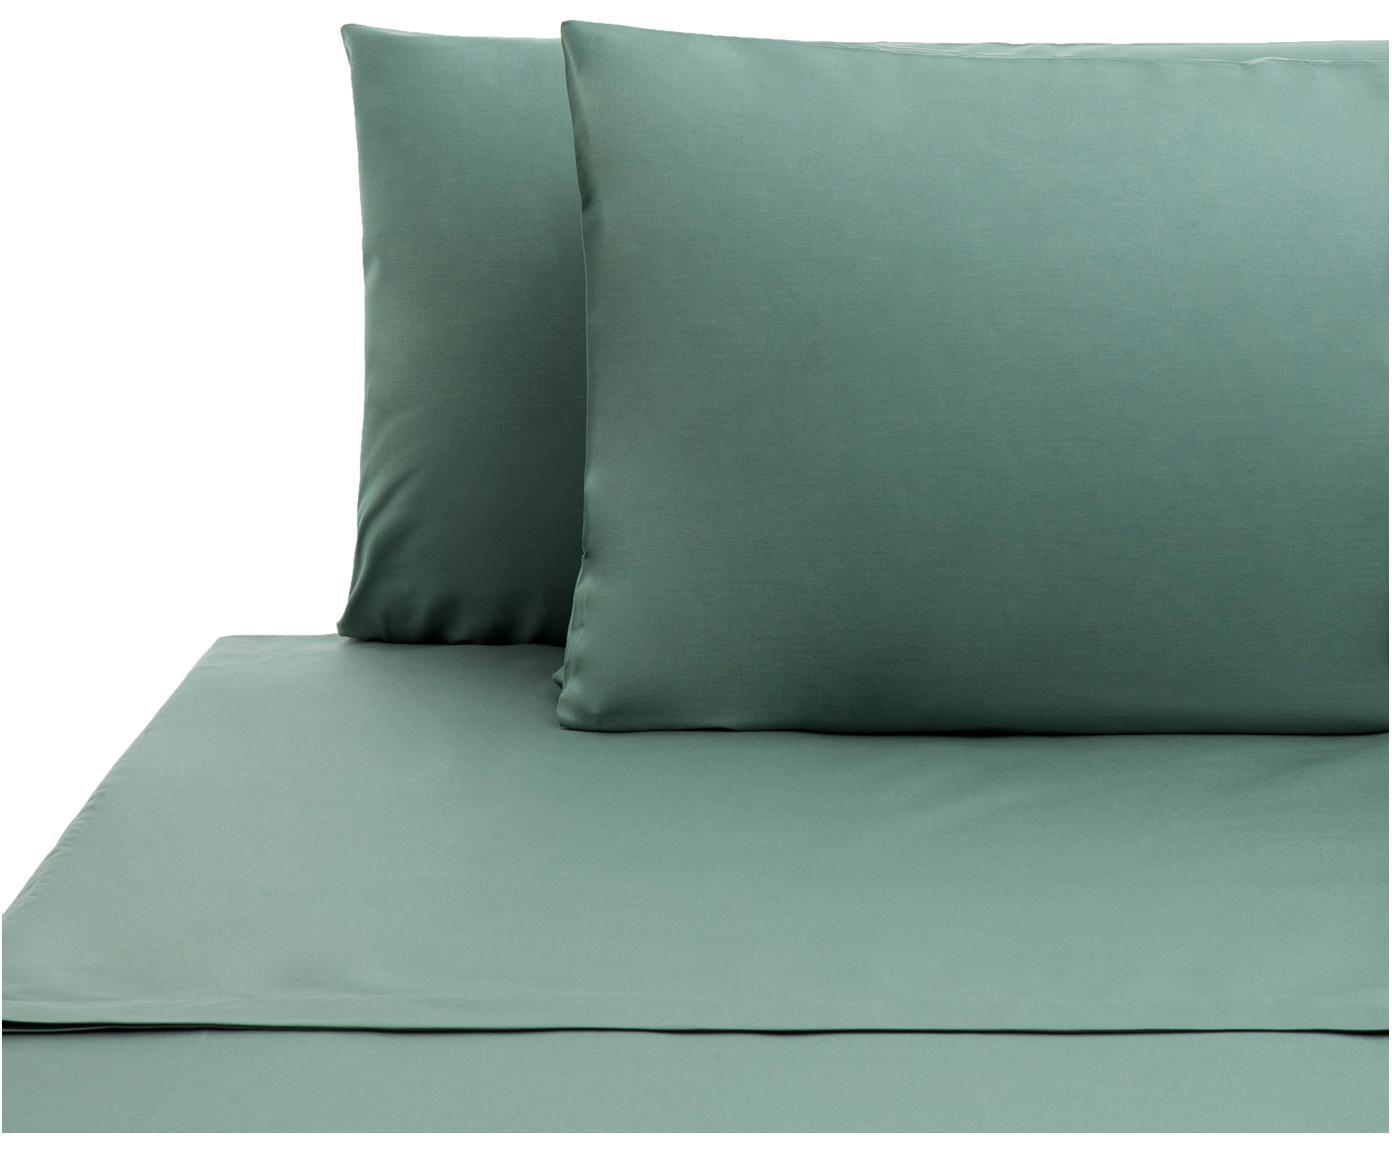 Set lenzuola in cotone ranforce Lenare 2 pz, Tessuto: Renforcé, Fronte e retro: verde reseda, 240 x 290 cm